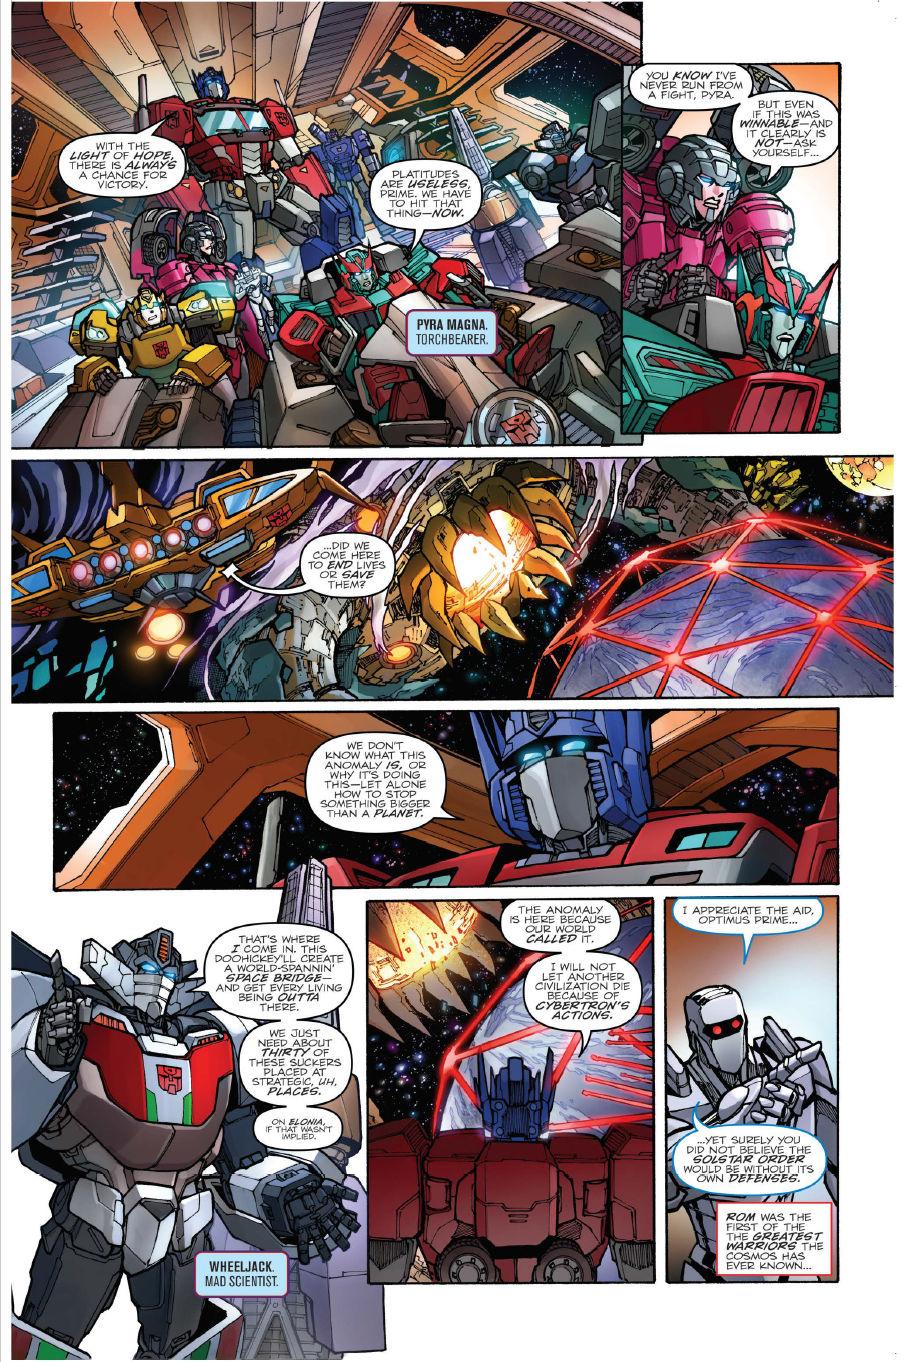 FCBD 2018 Transformers: Unicron #0 - Preview 3.